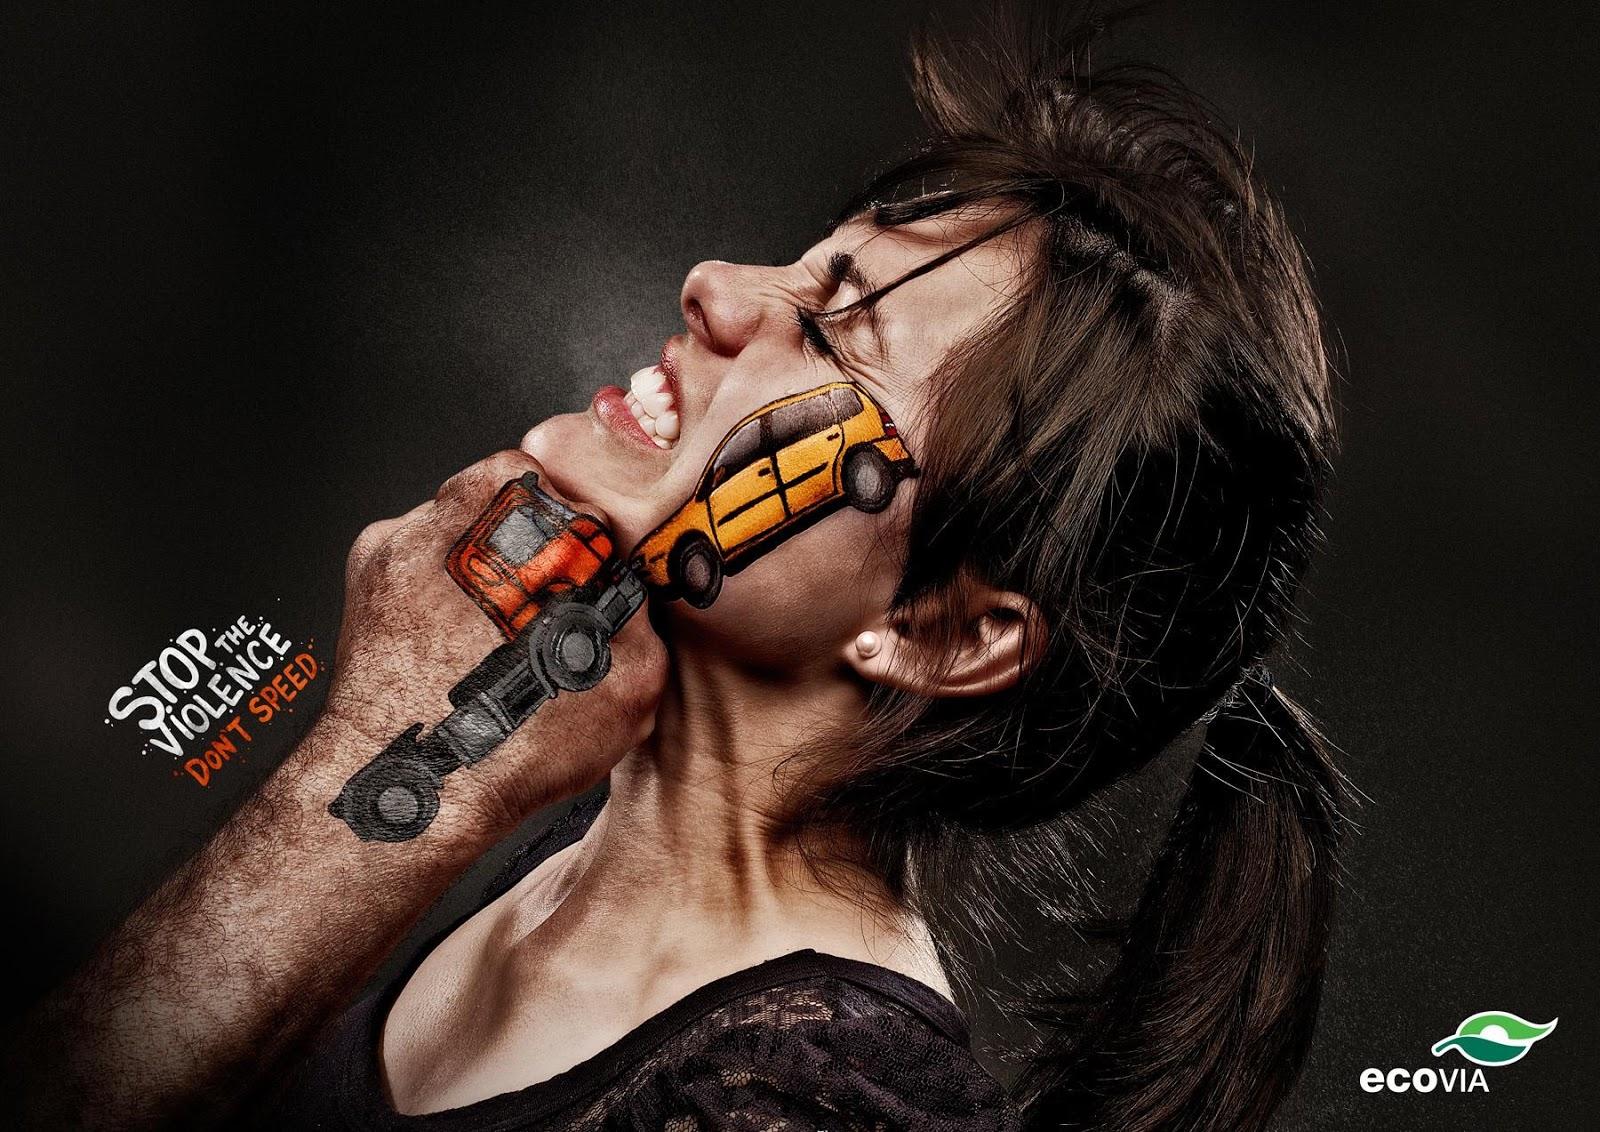 speed ad using neuromarketing